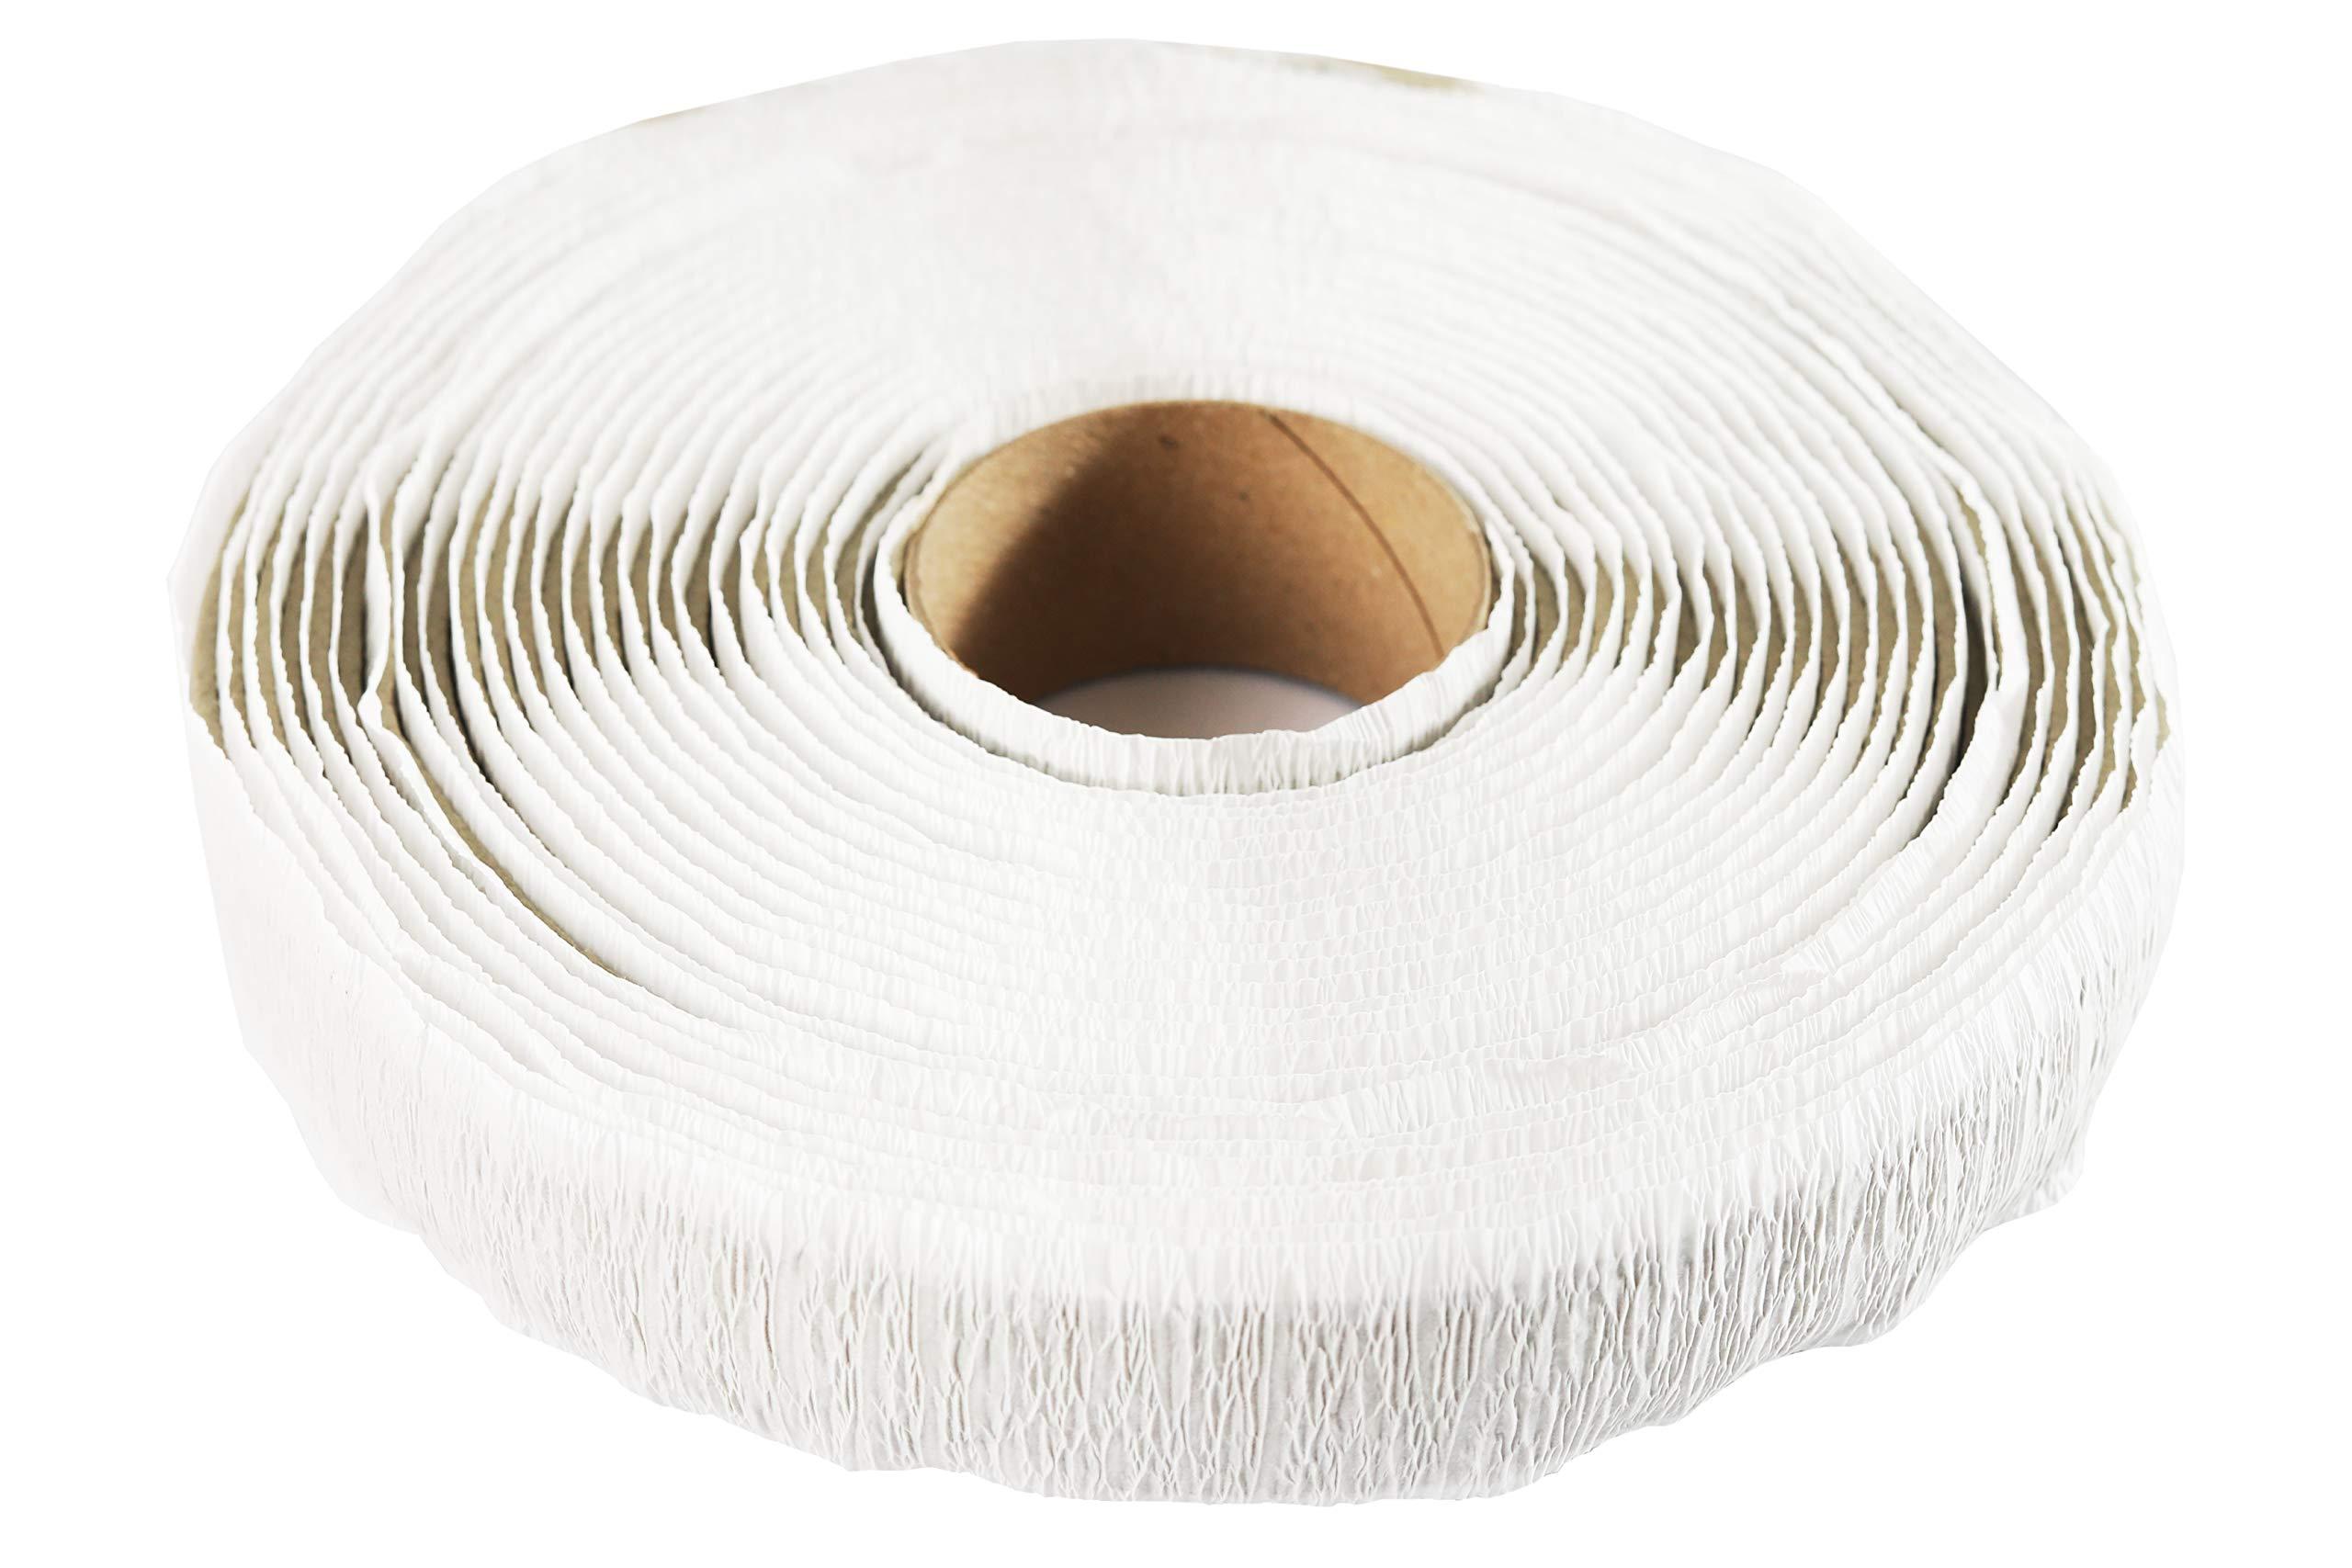 Butyl Putty Tape Window Flange Tape Camper RV Roof and Window Sealant RV Putty Tape (1/8'' x 1'' x 30')